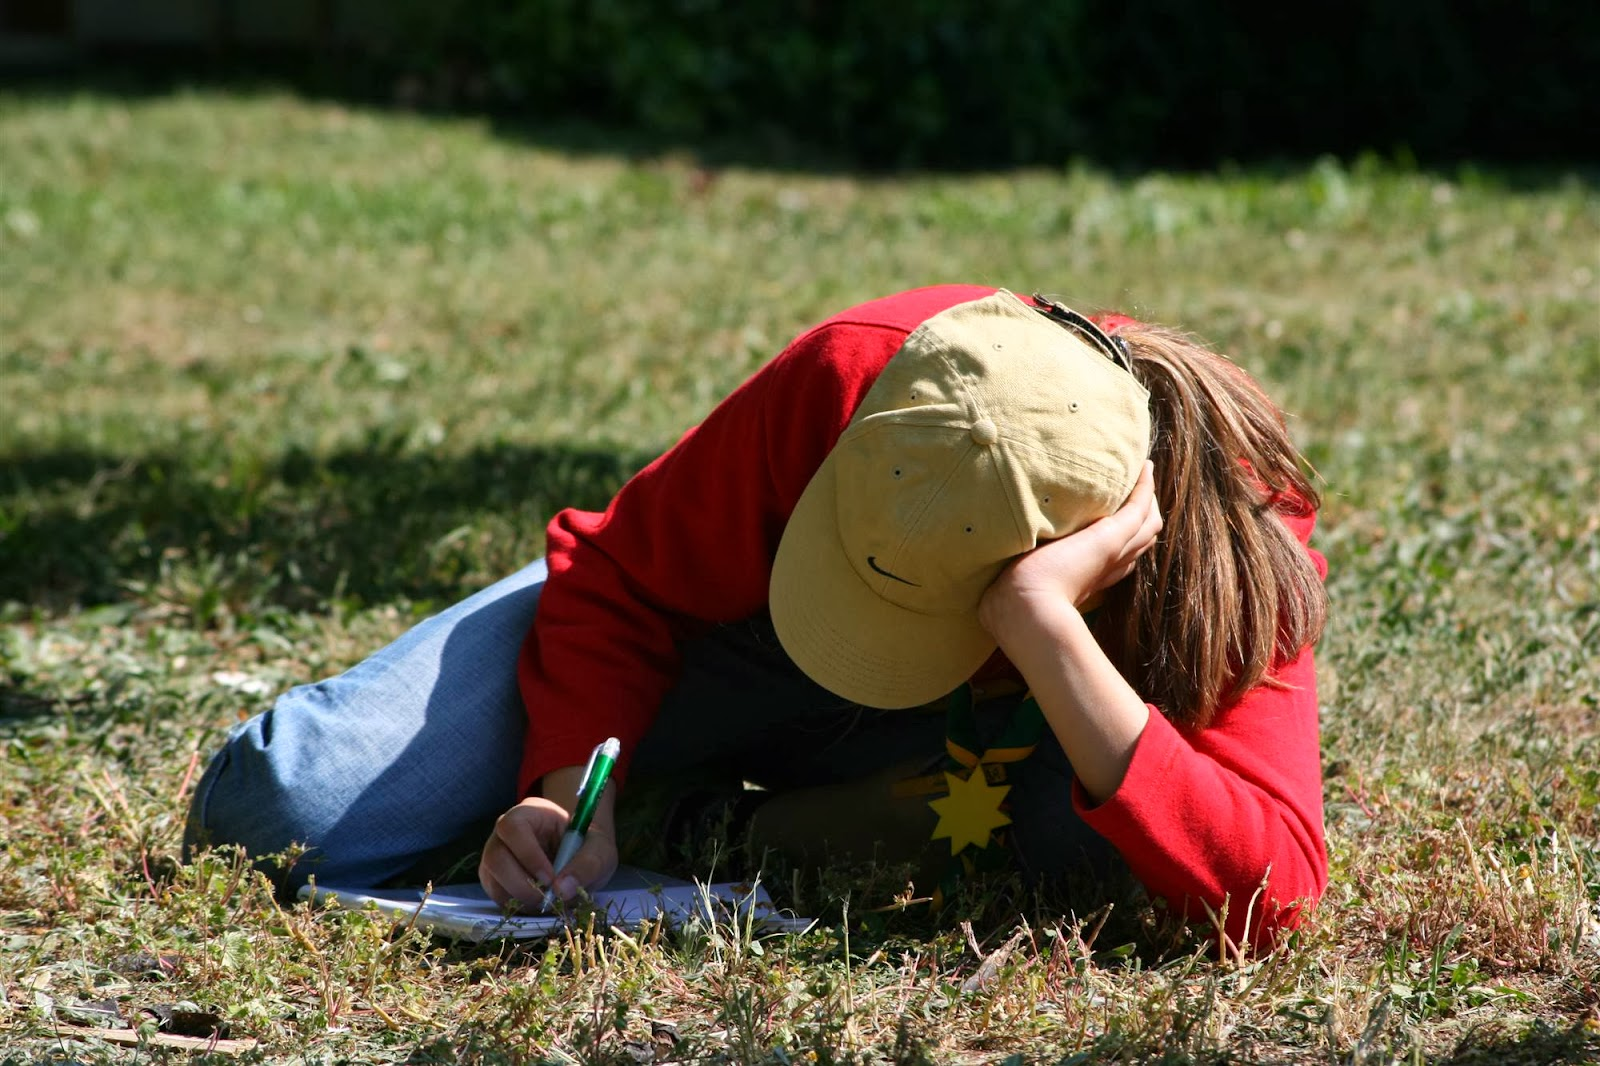 Področni mnogoboj, Sežana 2007 - IMG_7952.jpg